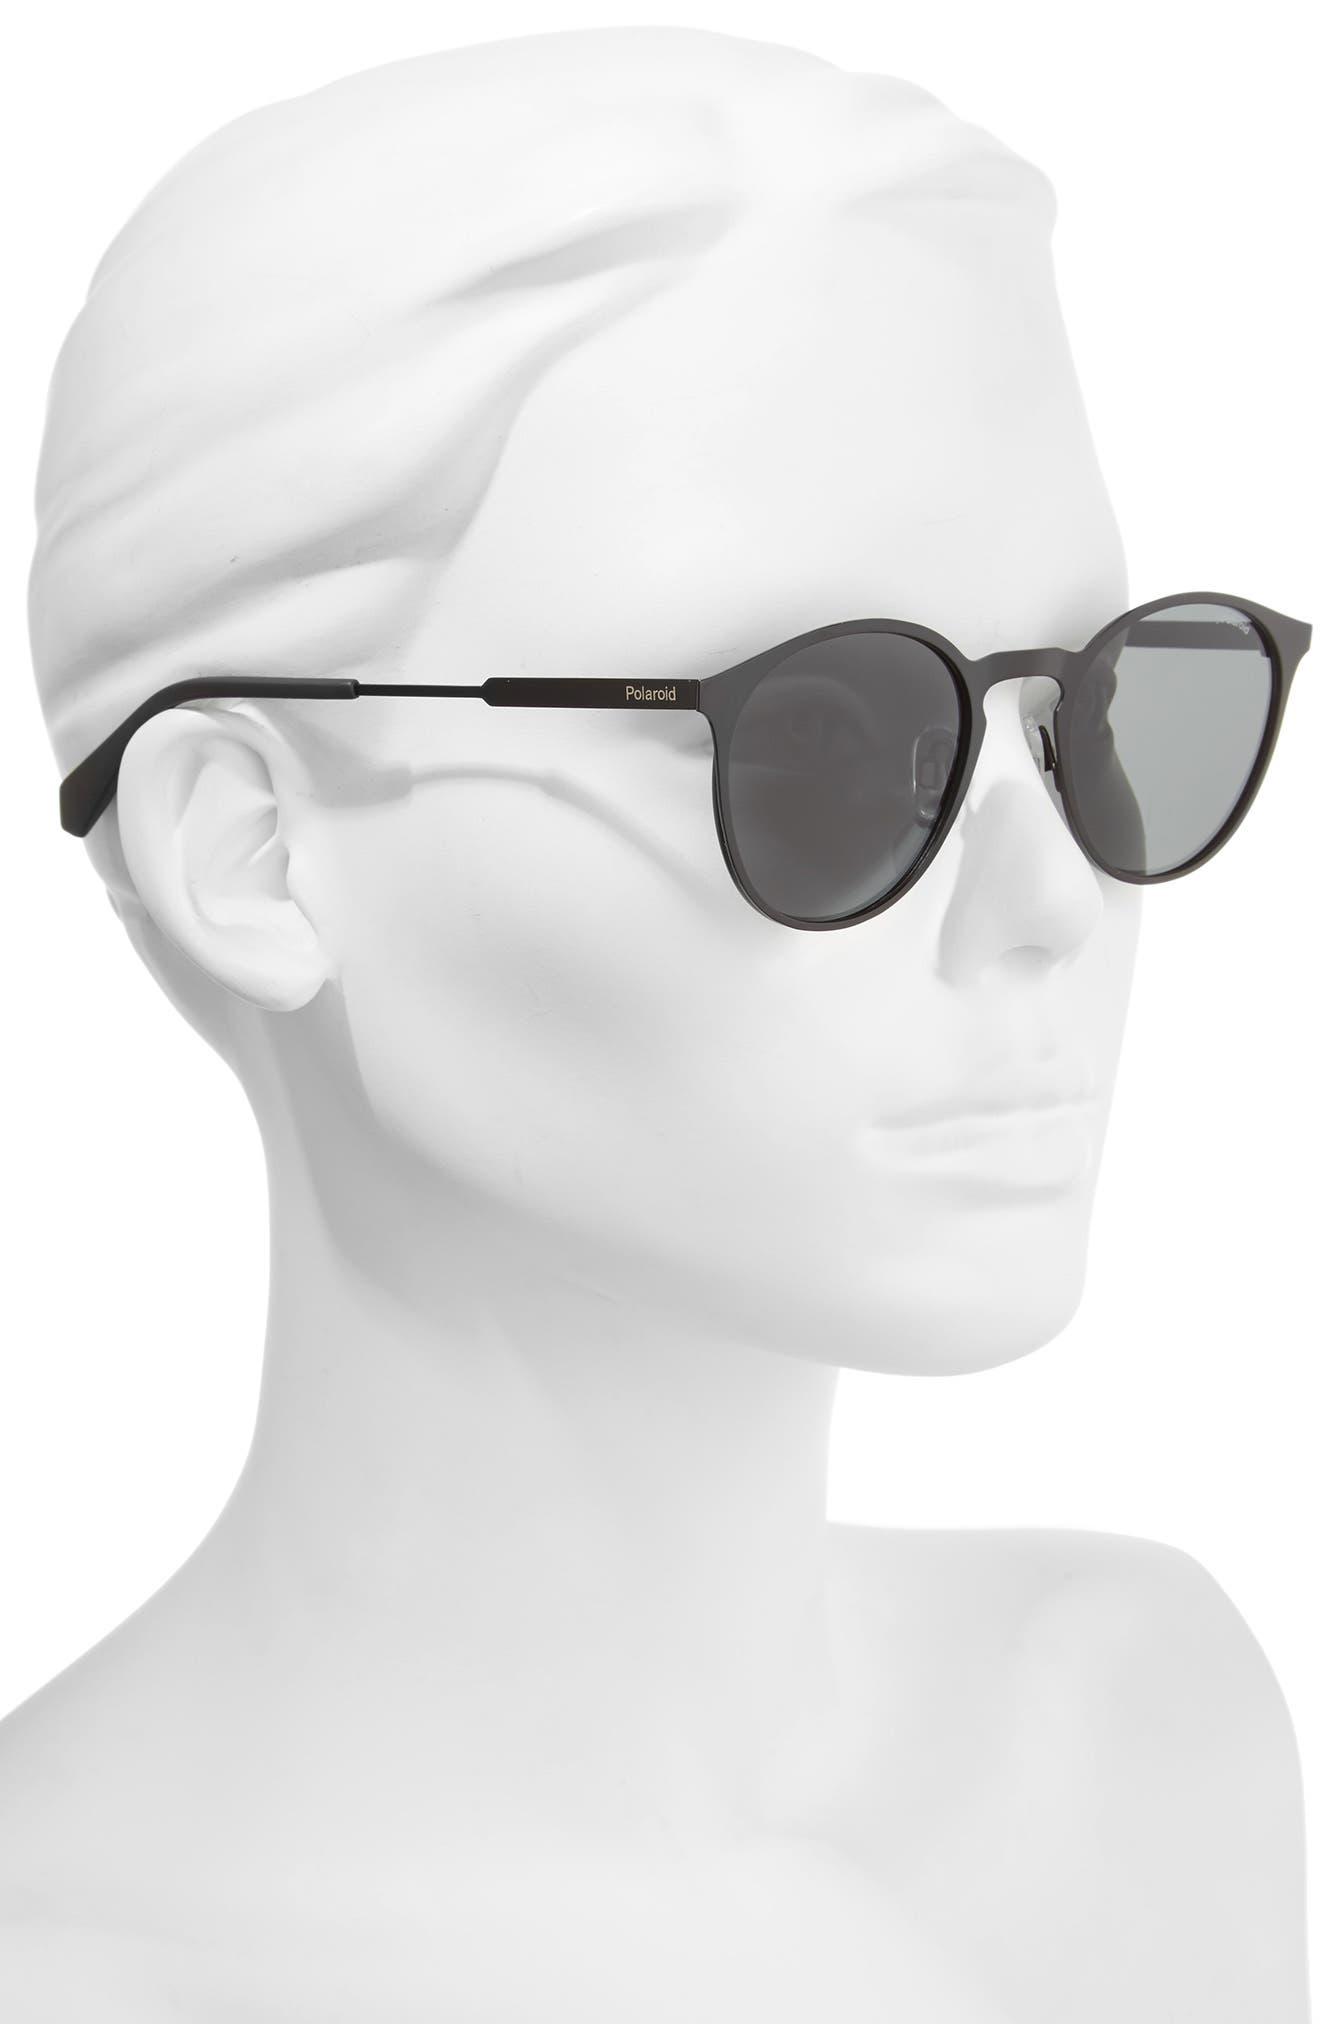 POLAROID EYEWEAR,                             Polaroid 50mm Round Polarized Sunglasses,                             Alternate thumbnail 2, color,                             002